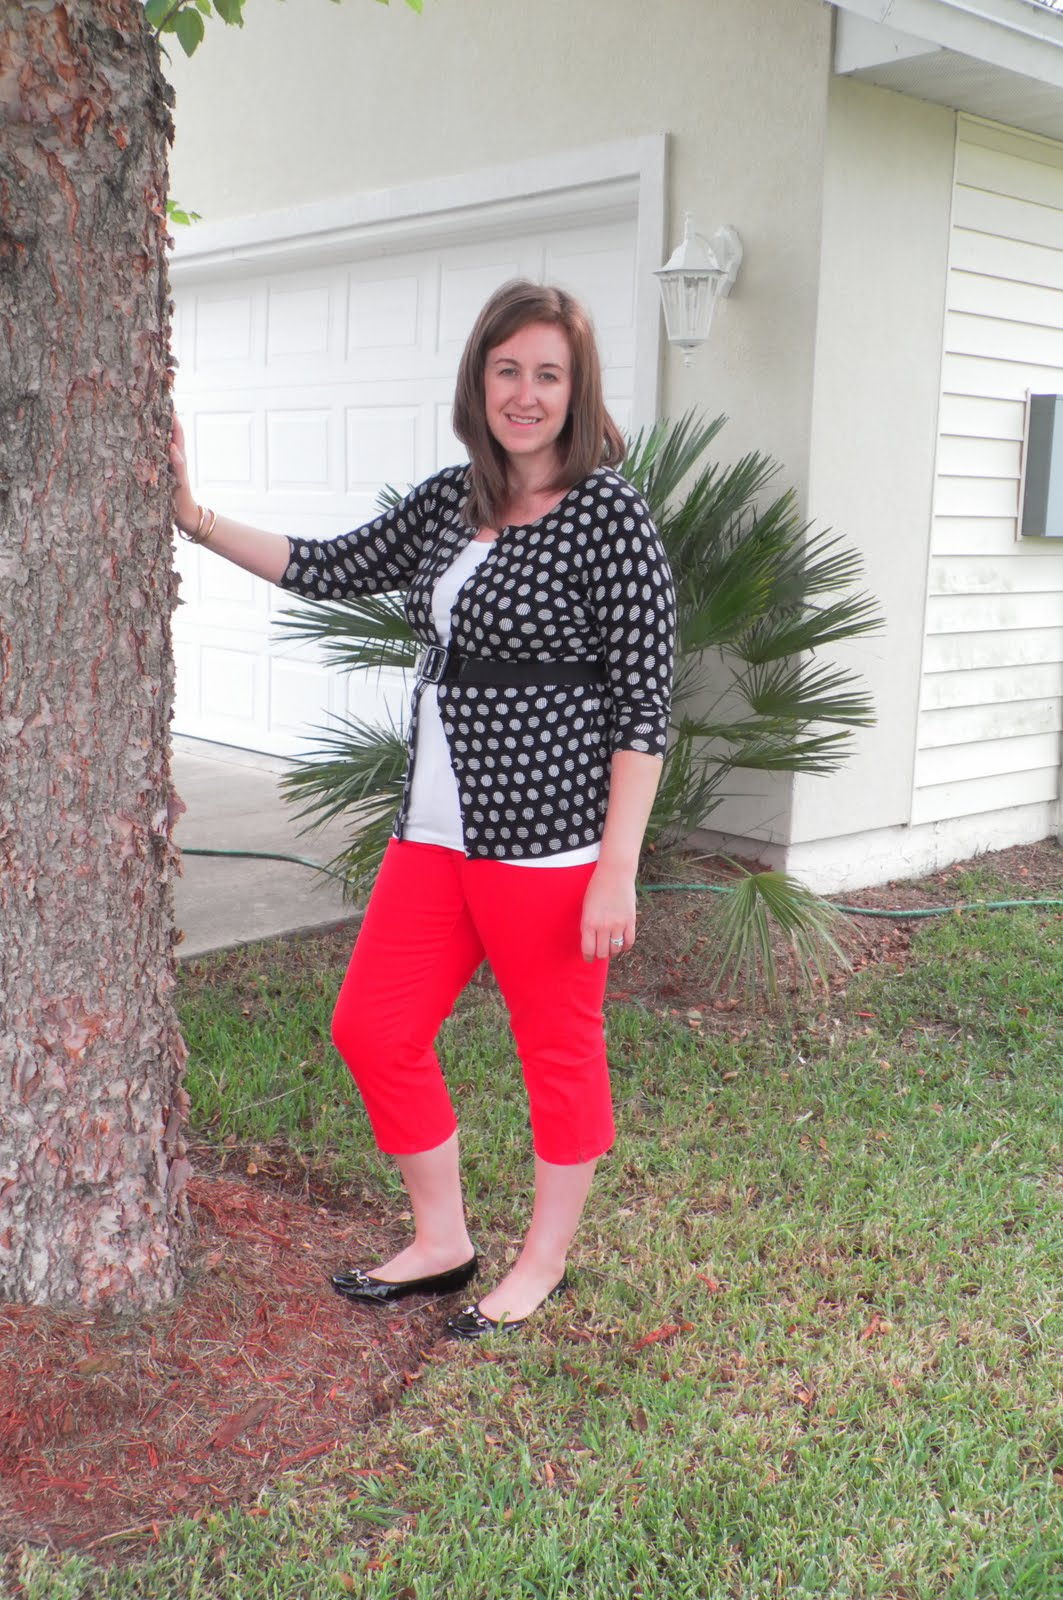 Fashion by alicia polka dots and red pants polka dots and red pants sisterspd